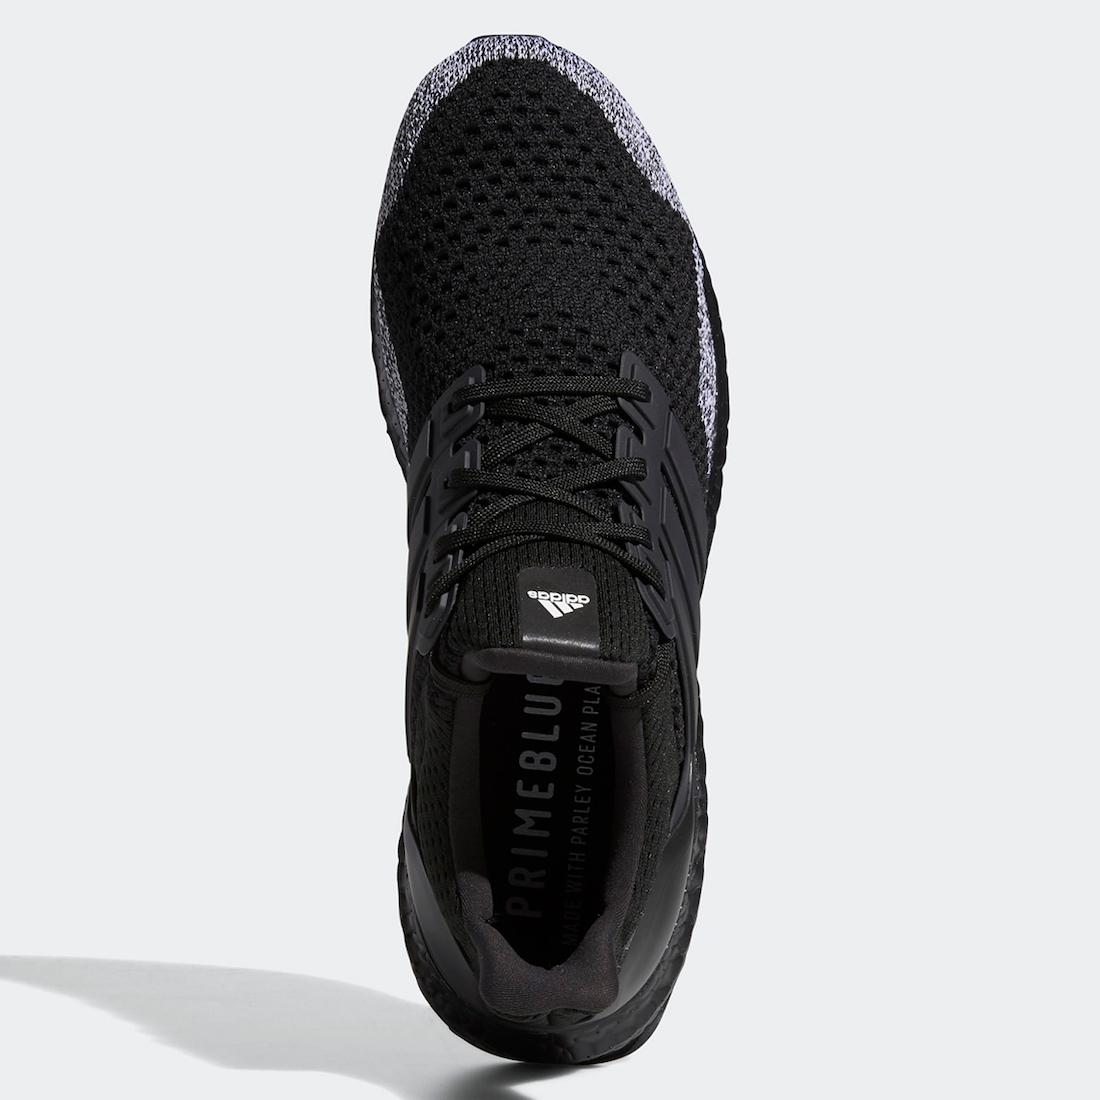 adidas Ultra Boost 1.0 DNA Oreo Toe GZ3150 Release Date Info